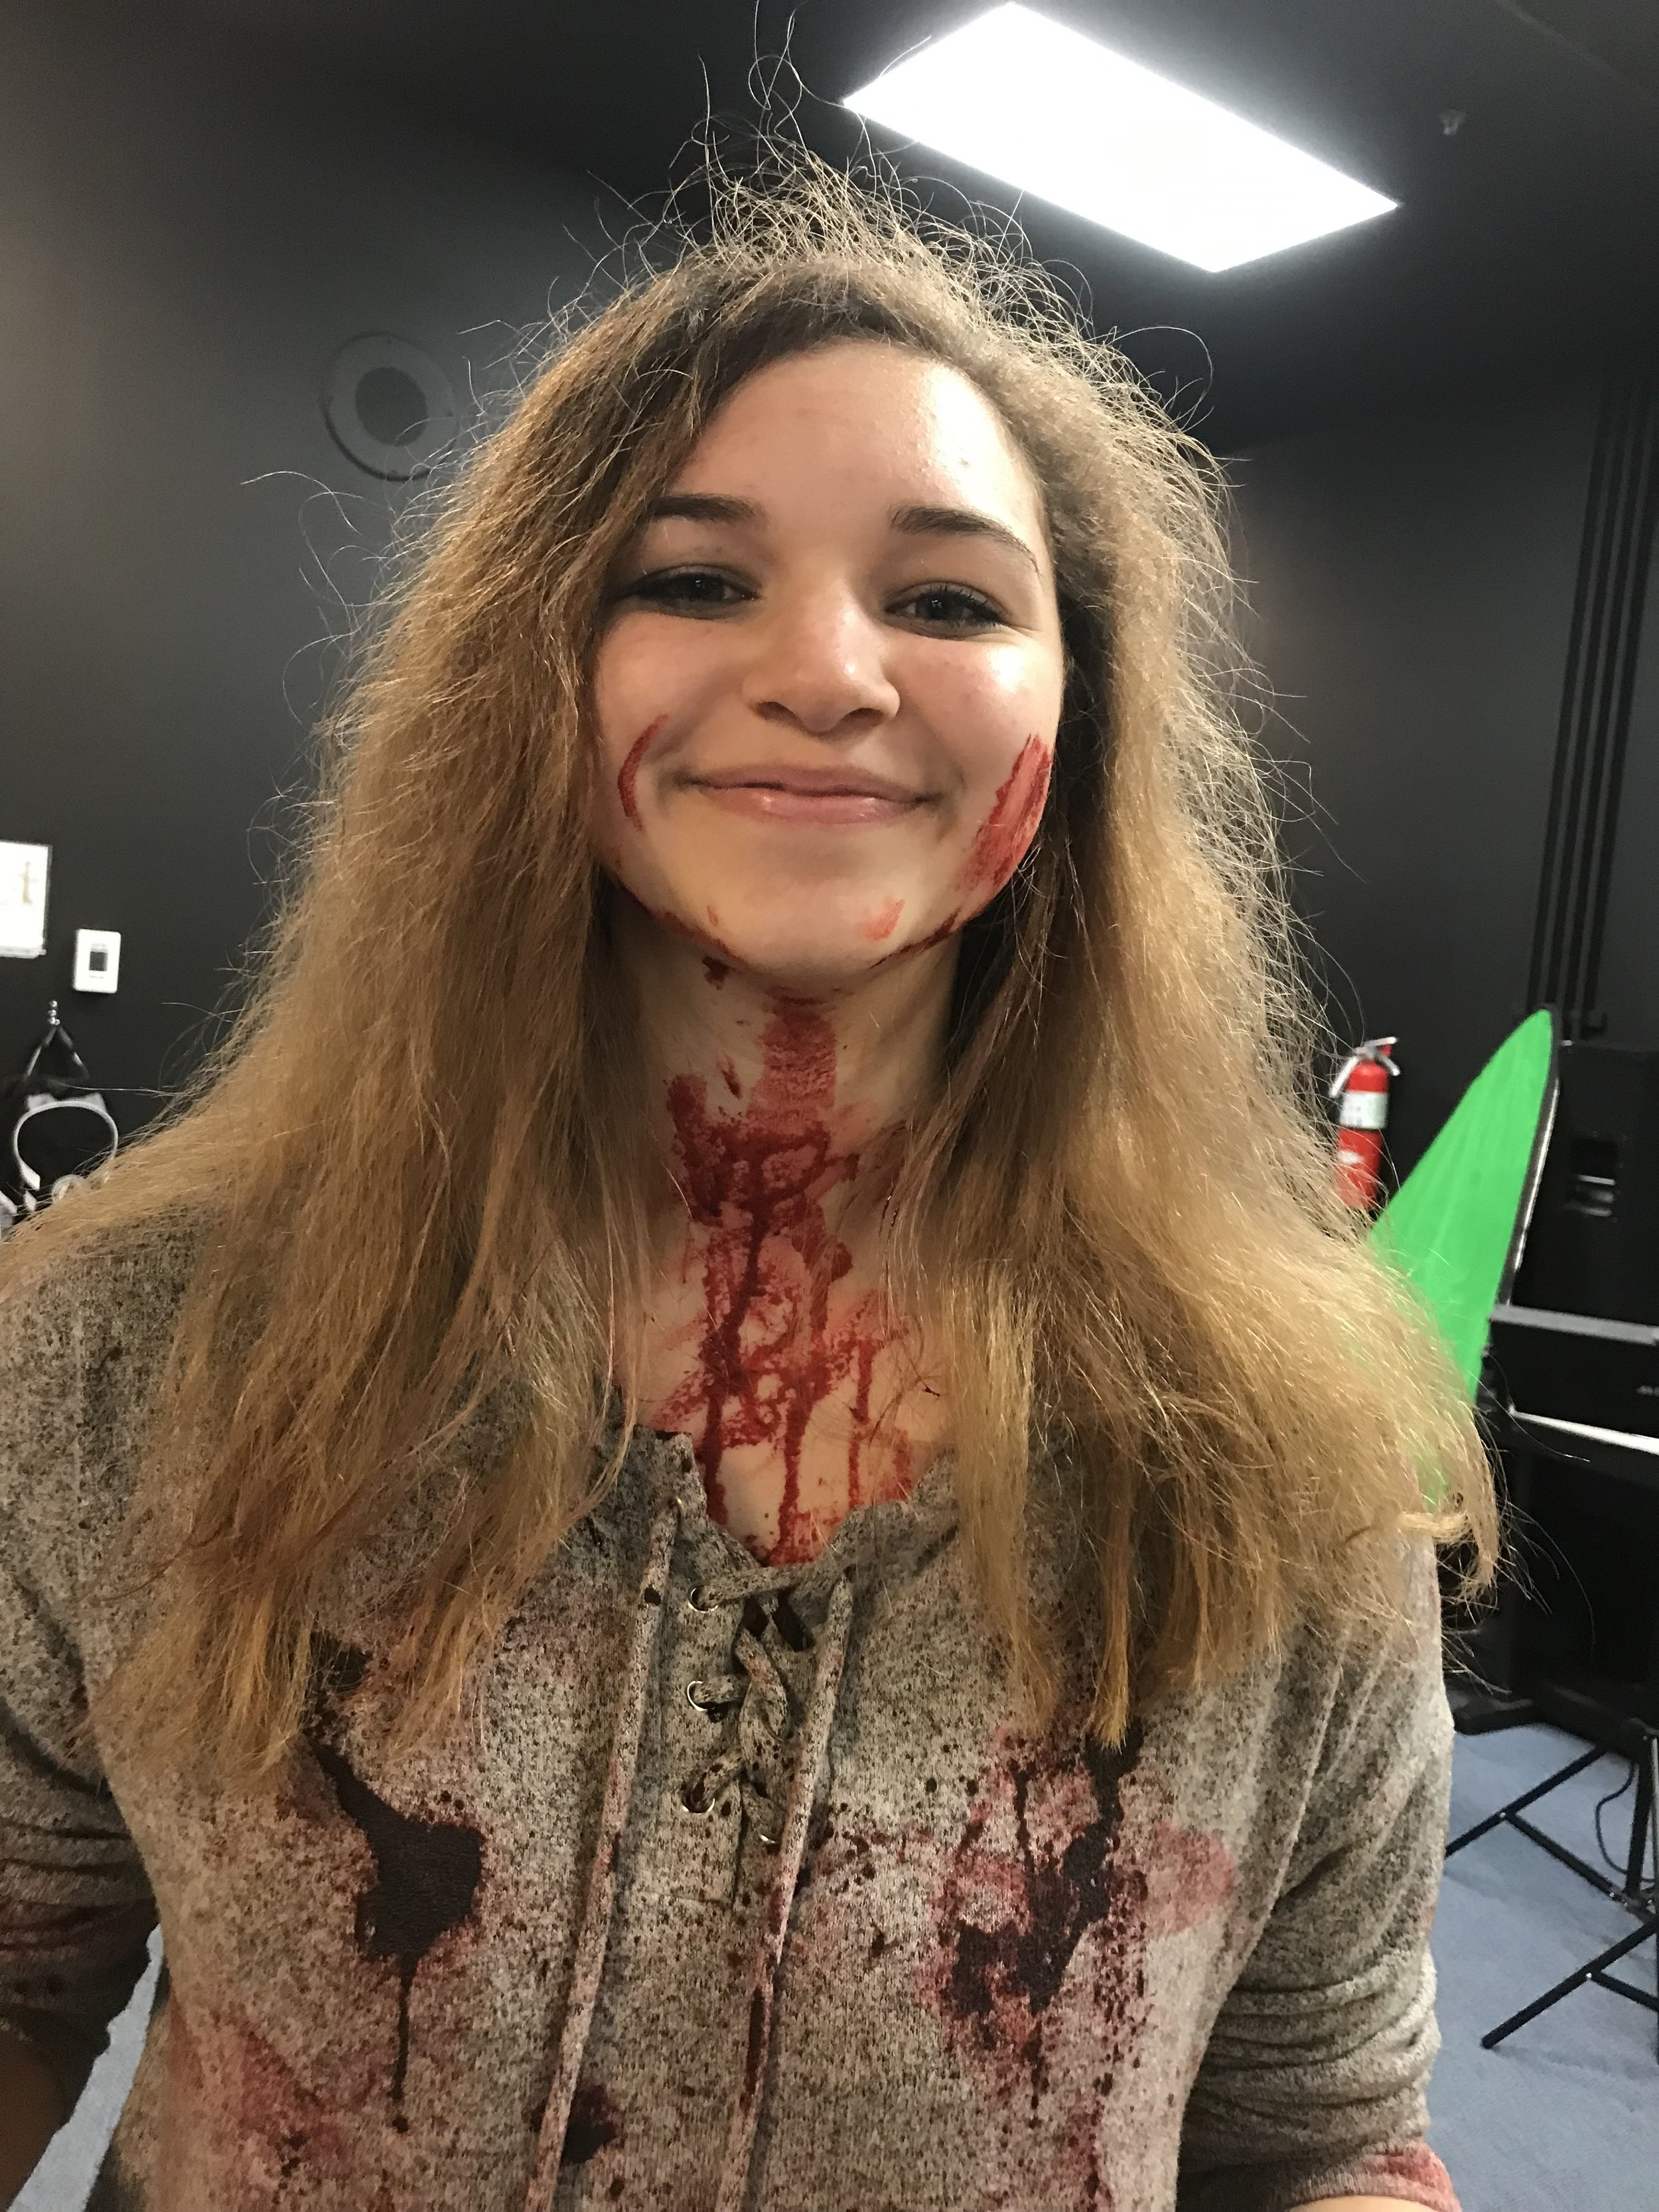 Jacey…victim or murderer? #NOspoilers